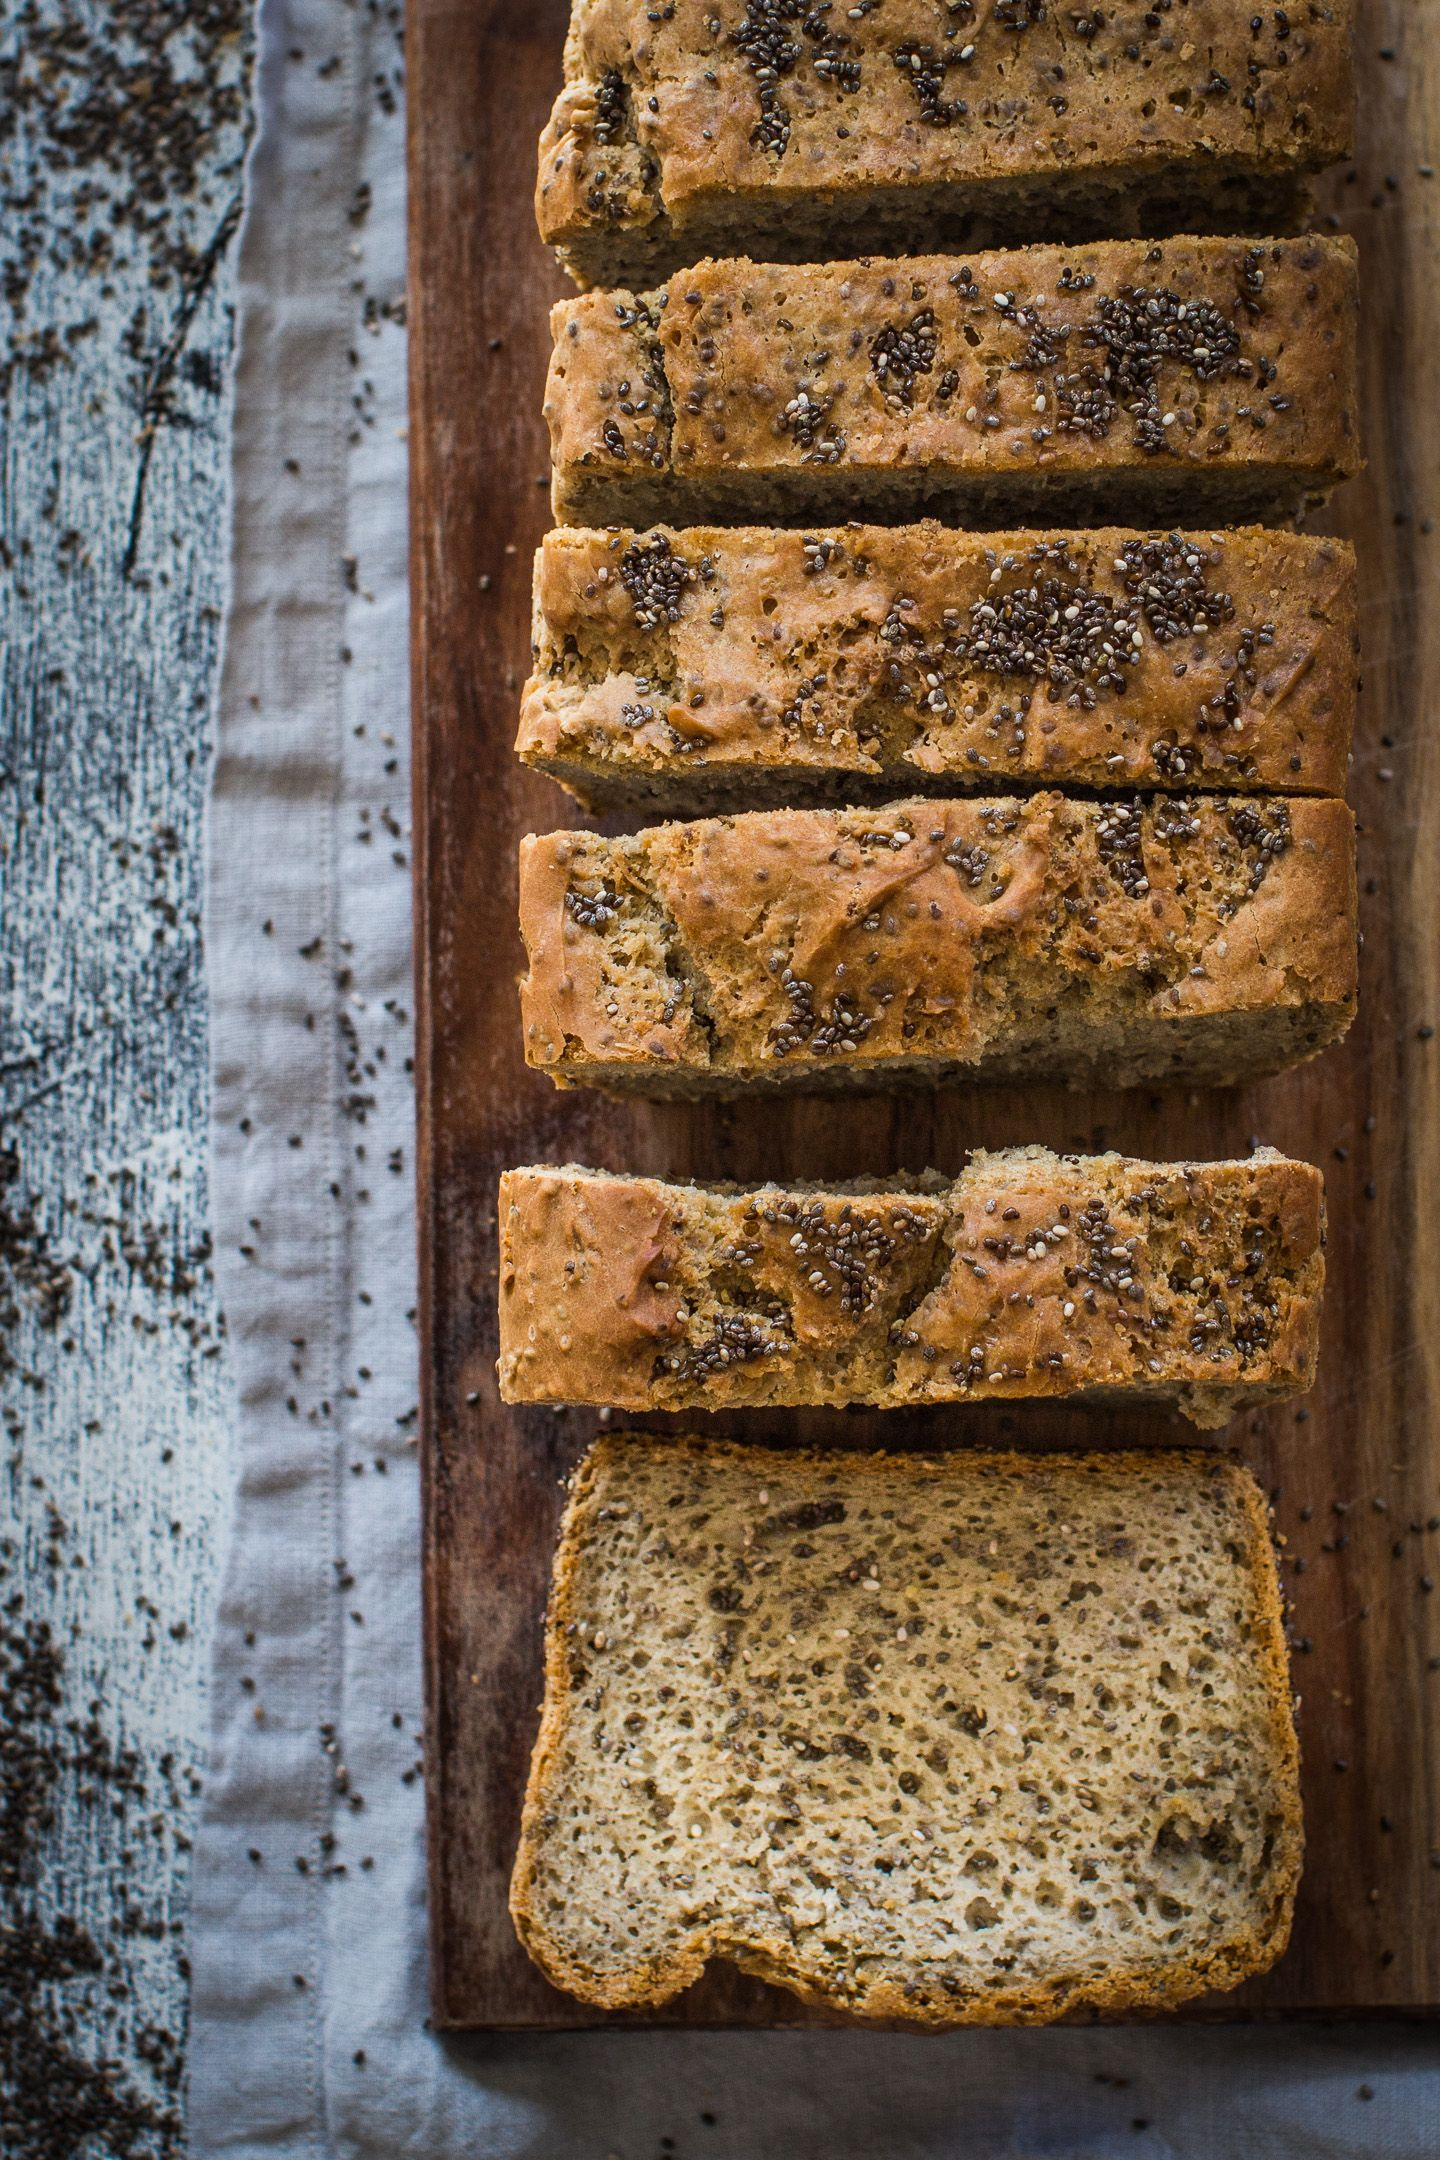 High Fibre Buckwheat Chia Gluten Free Bread Recipe Helen Tzouganatos Gluten Free Recipes Recipe In 2020 Gluten Free Bread Buckwheat Bread Bread Recipes